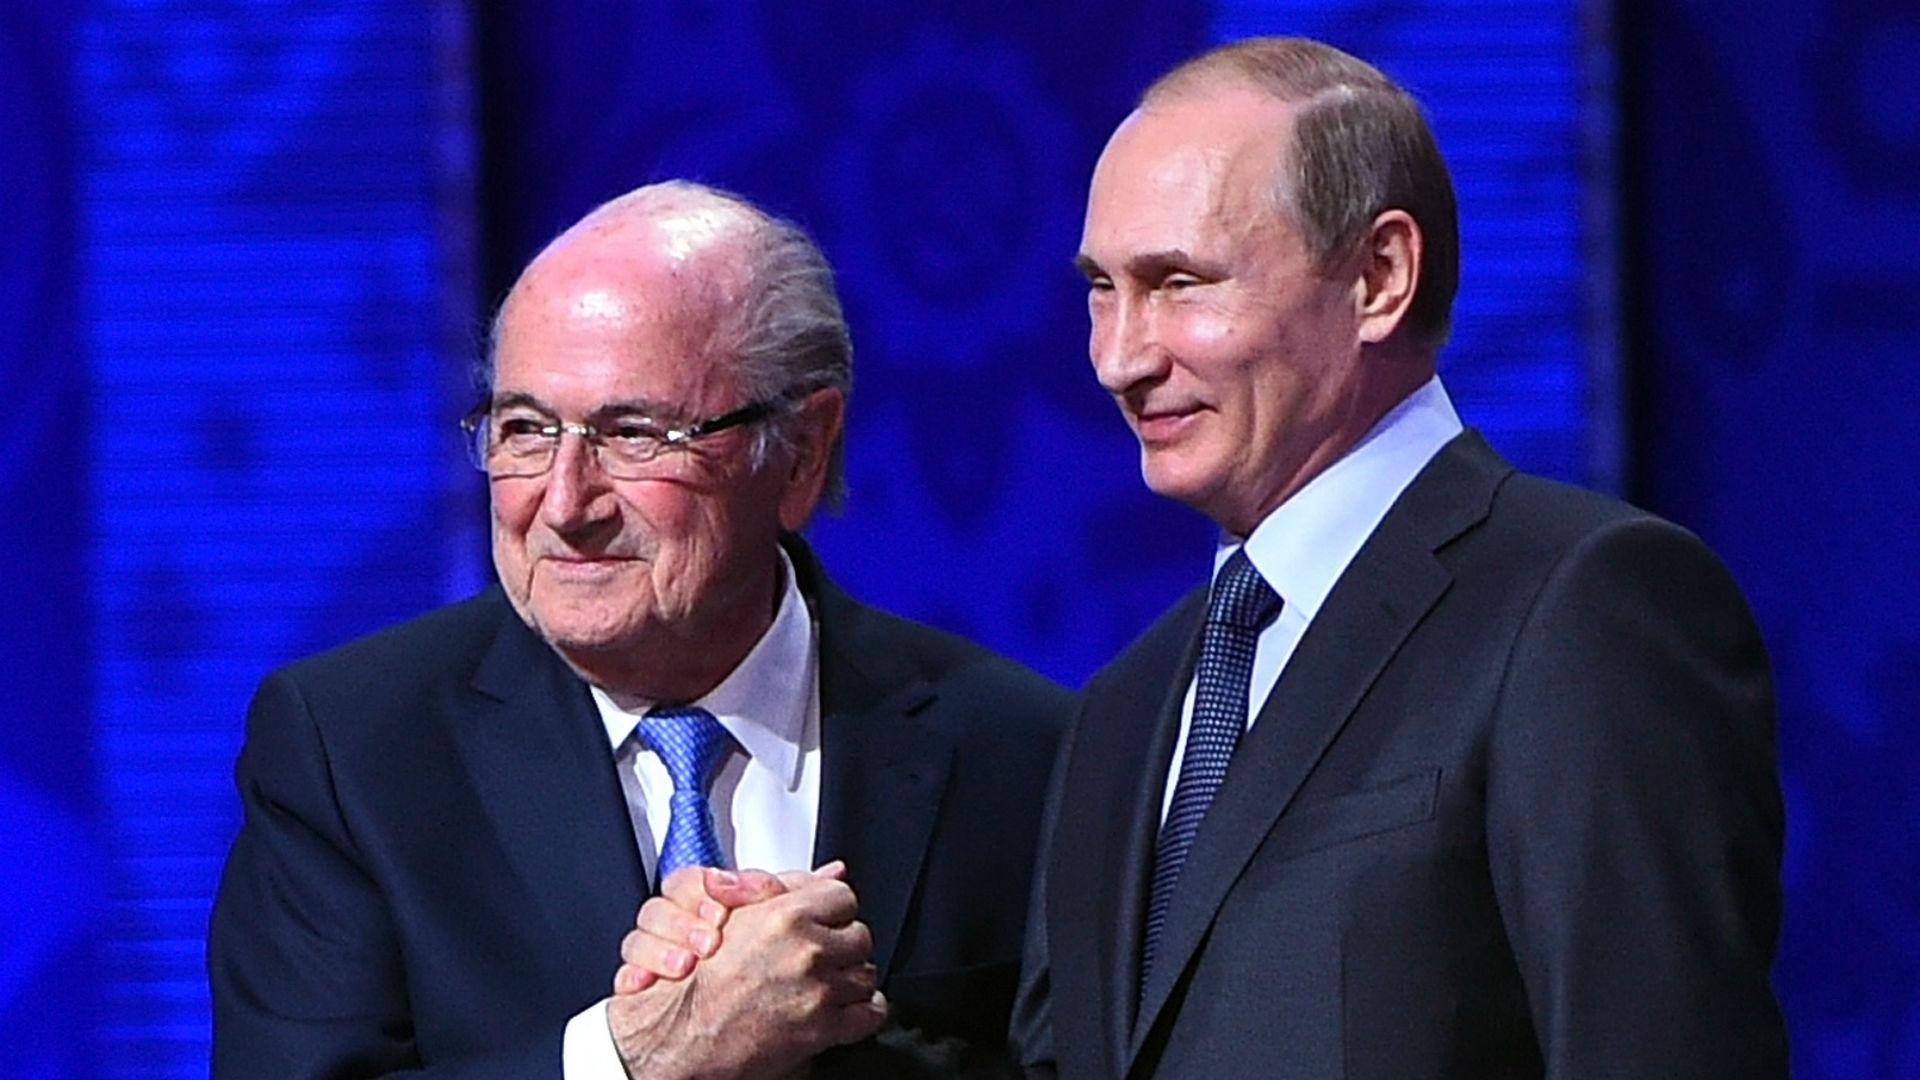 Sepp Blatter and Russia president Vladimir Putin